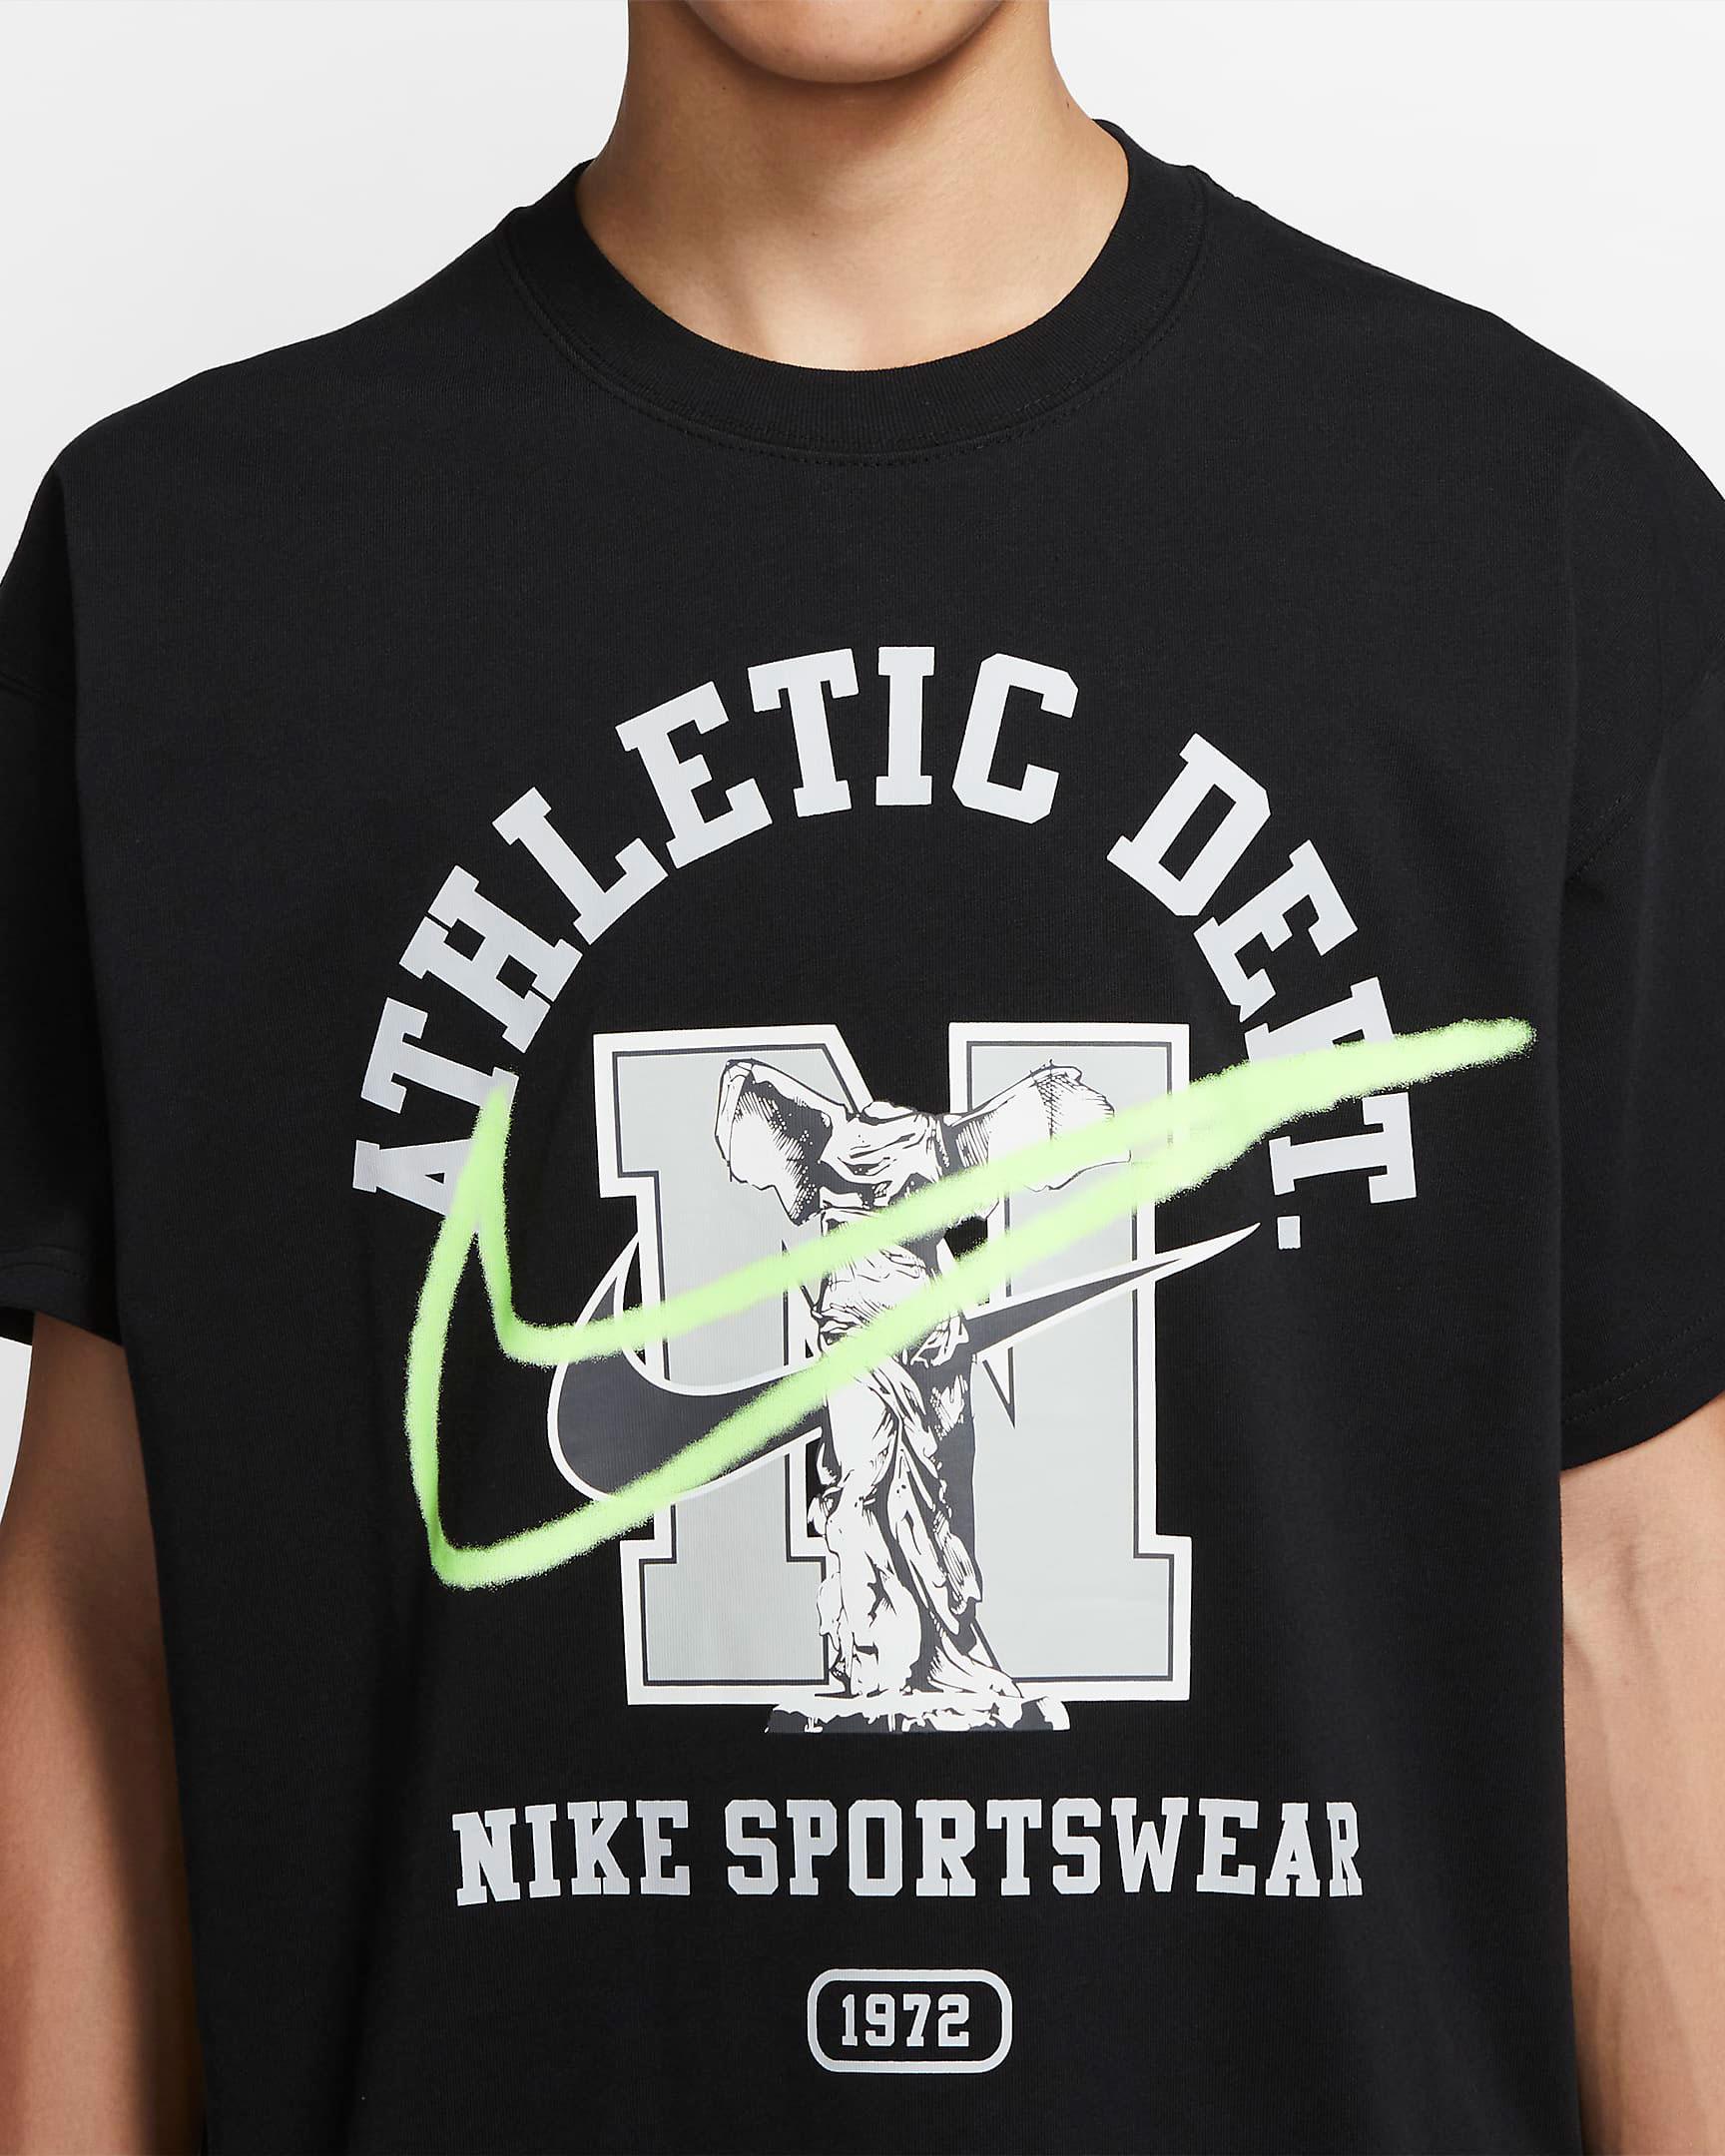 nike-sportswear-class-of-72-shirt-black-vol2